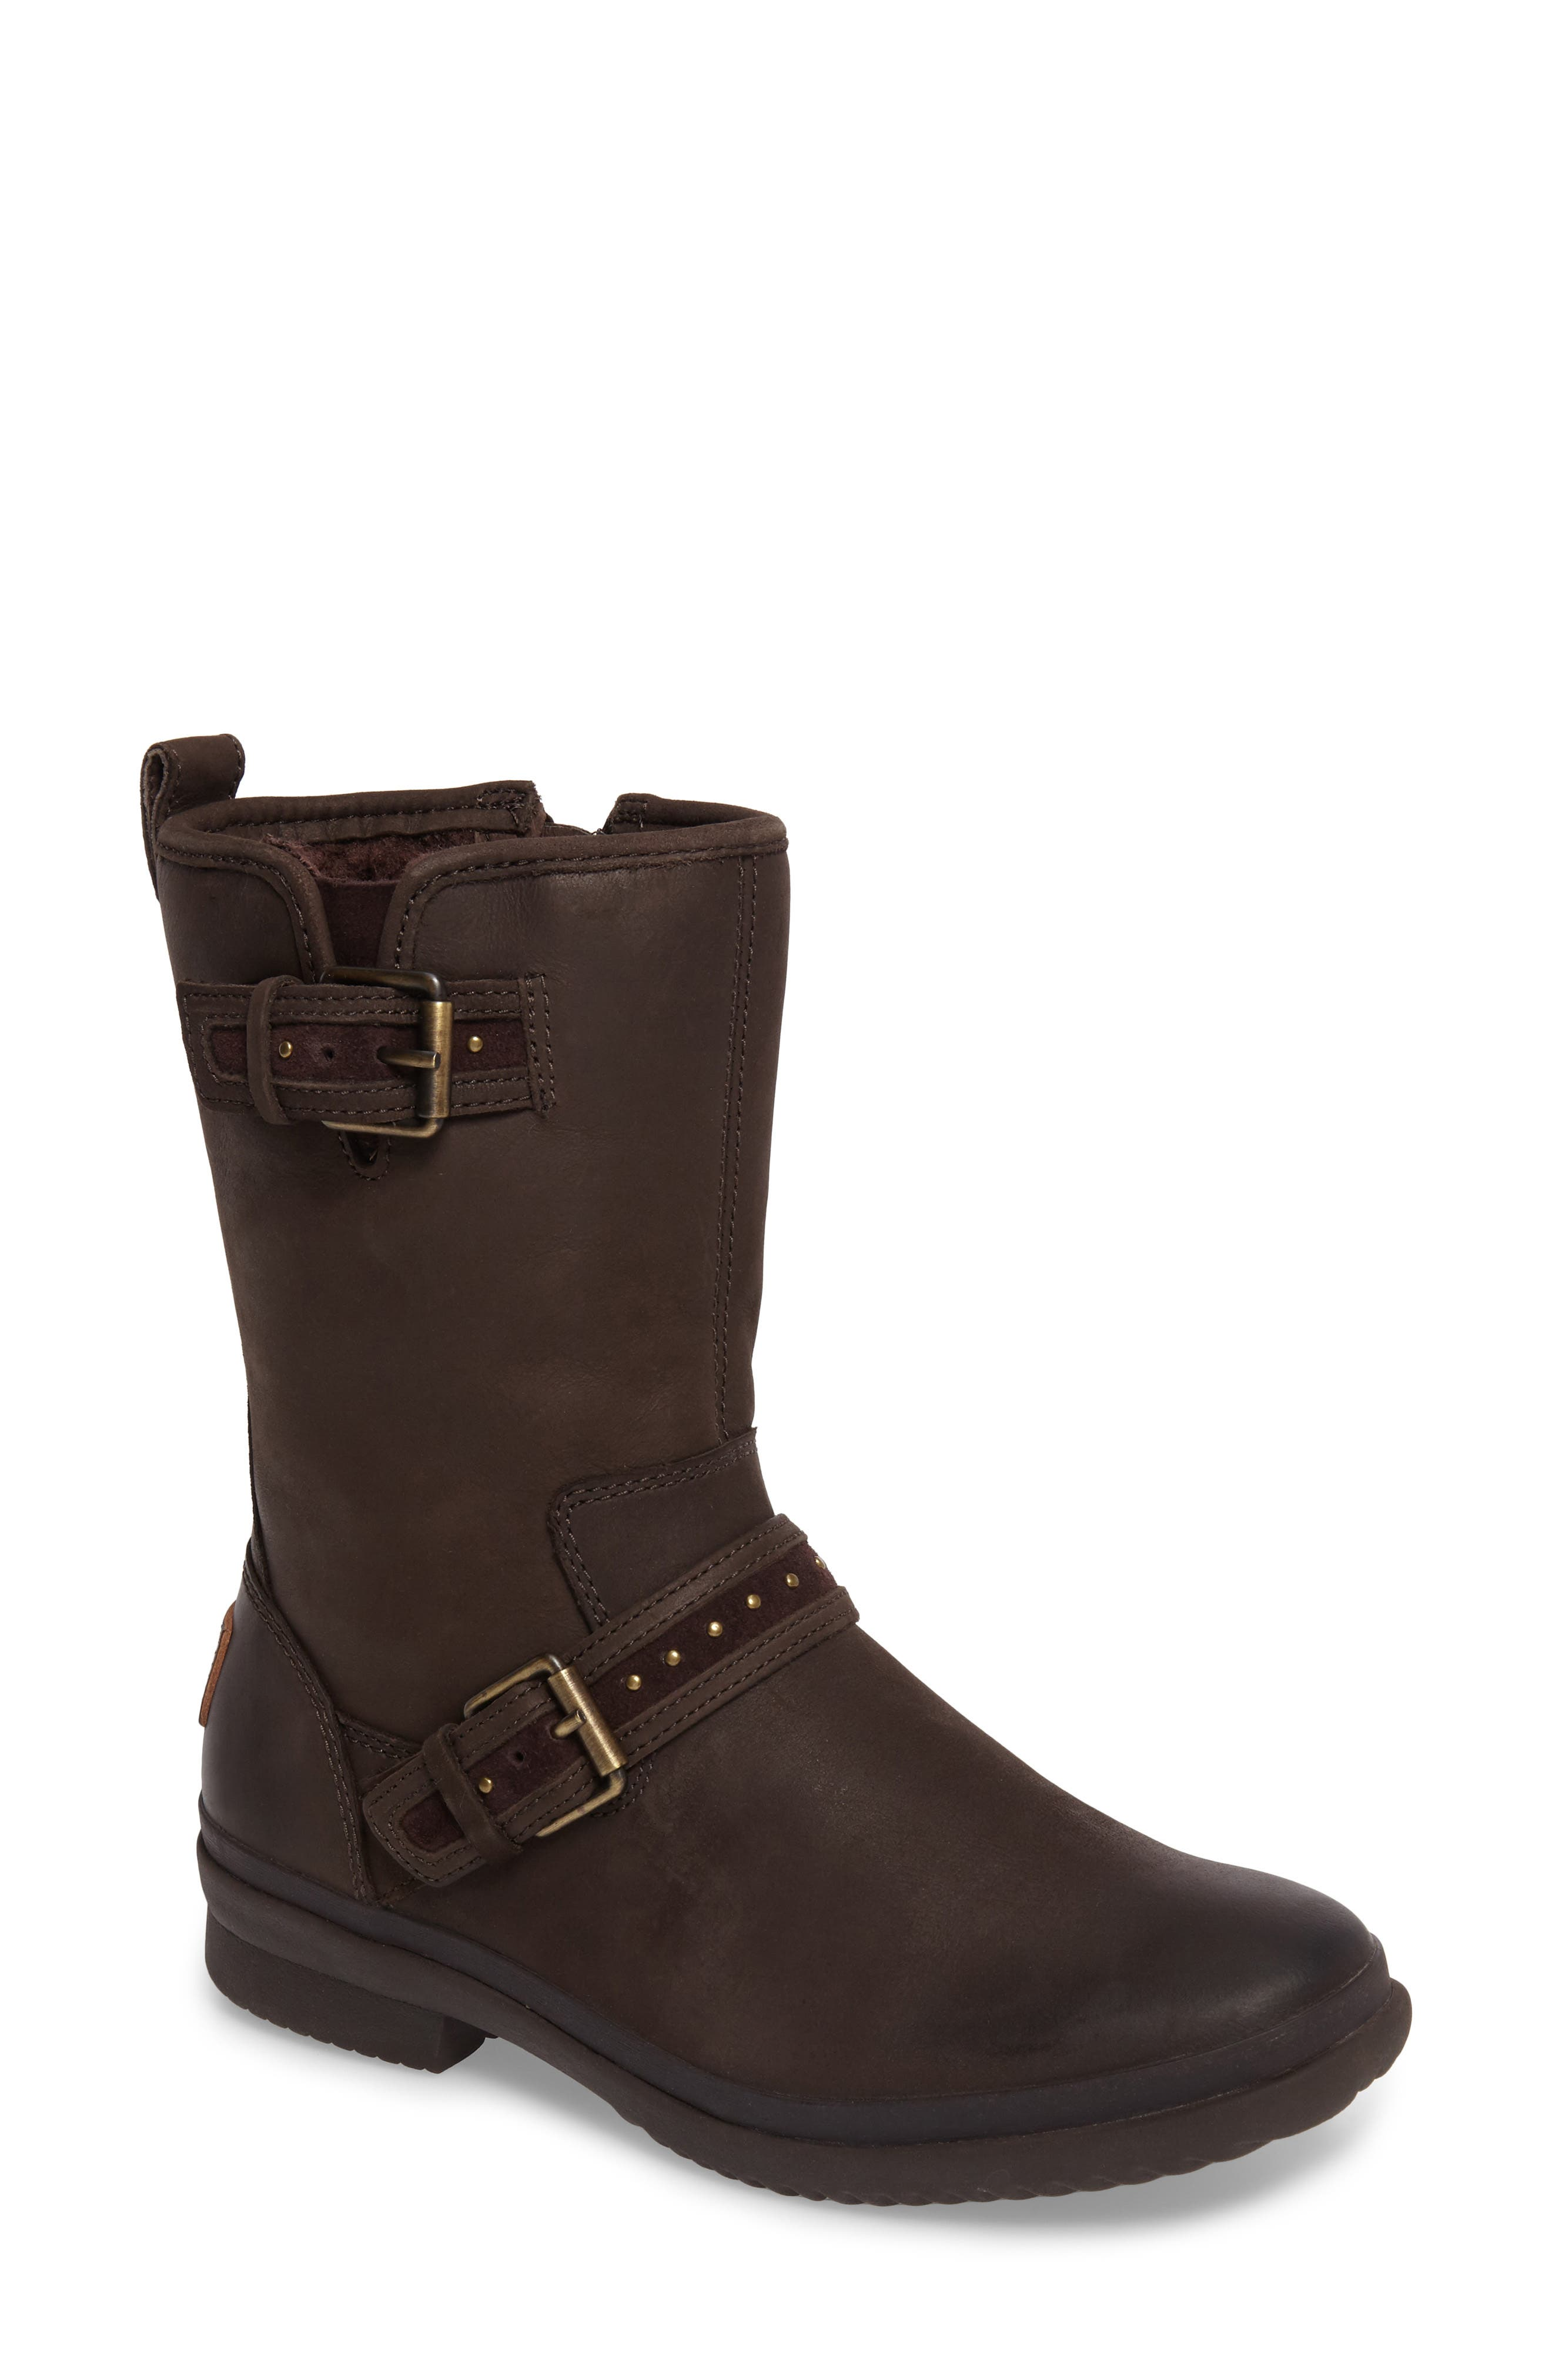 Alternate Image 1 Selected - UGG® Jenise Waterproof Boot (Women)